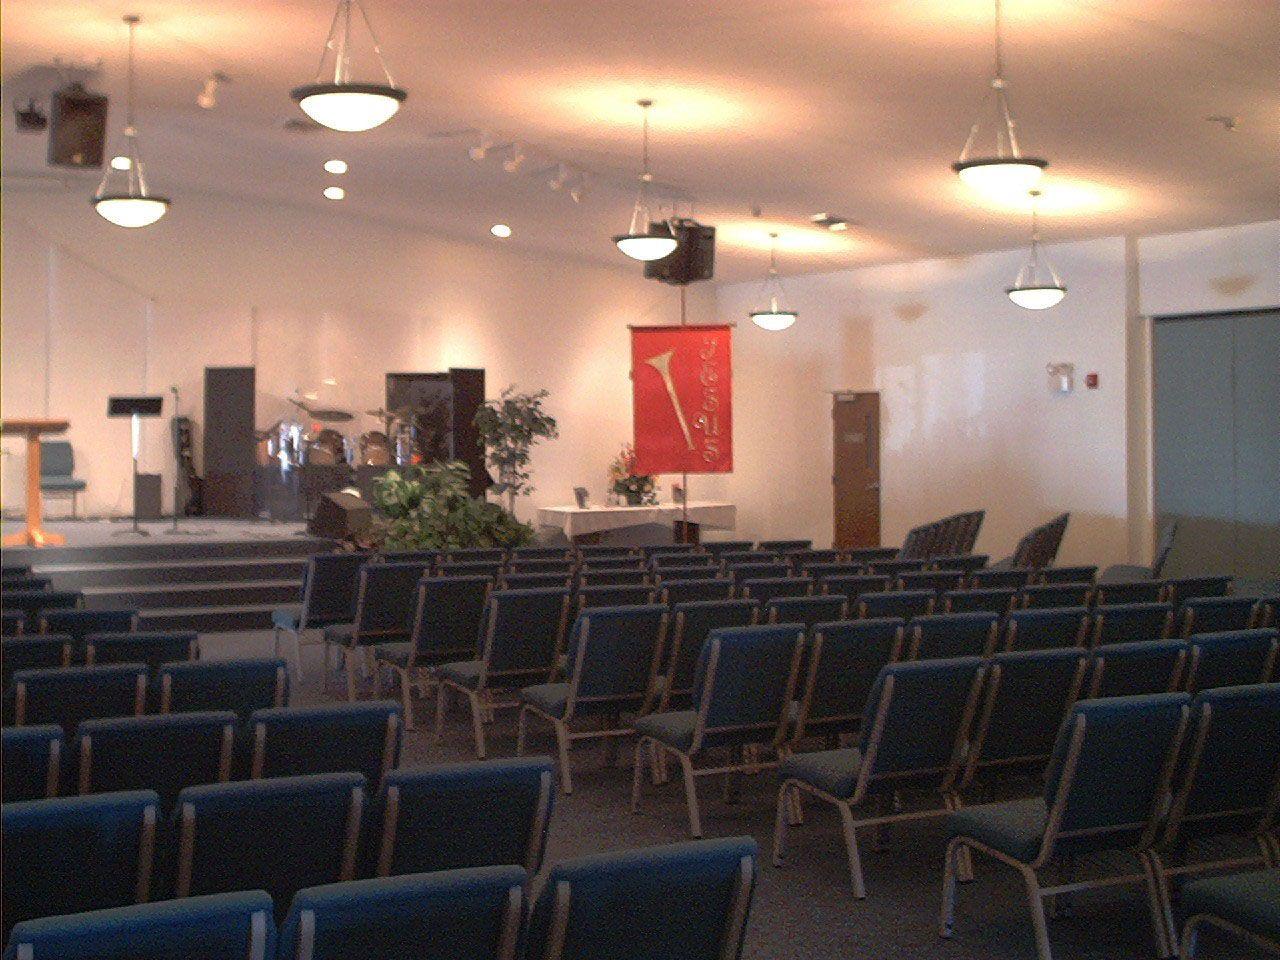 10000 sq ft church plans. 34 best Church plans images on Pinterest  ideas Buildings and design